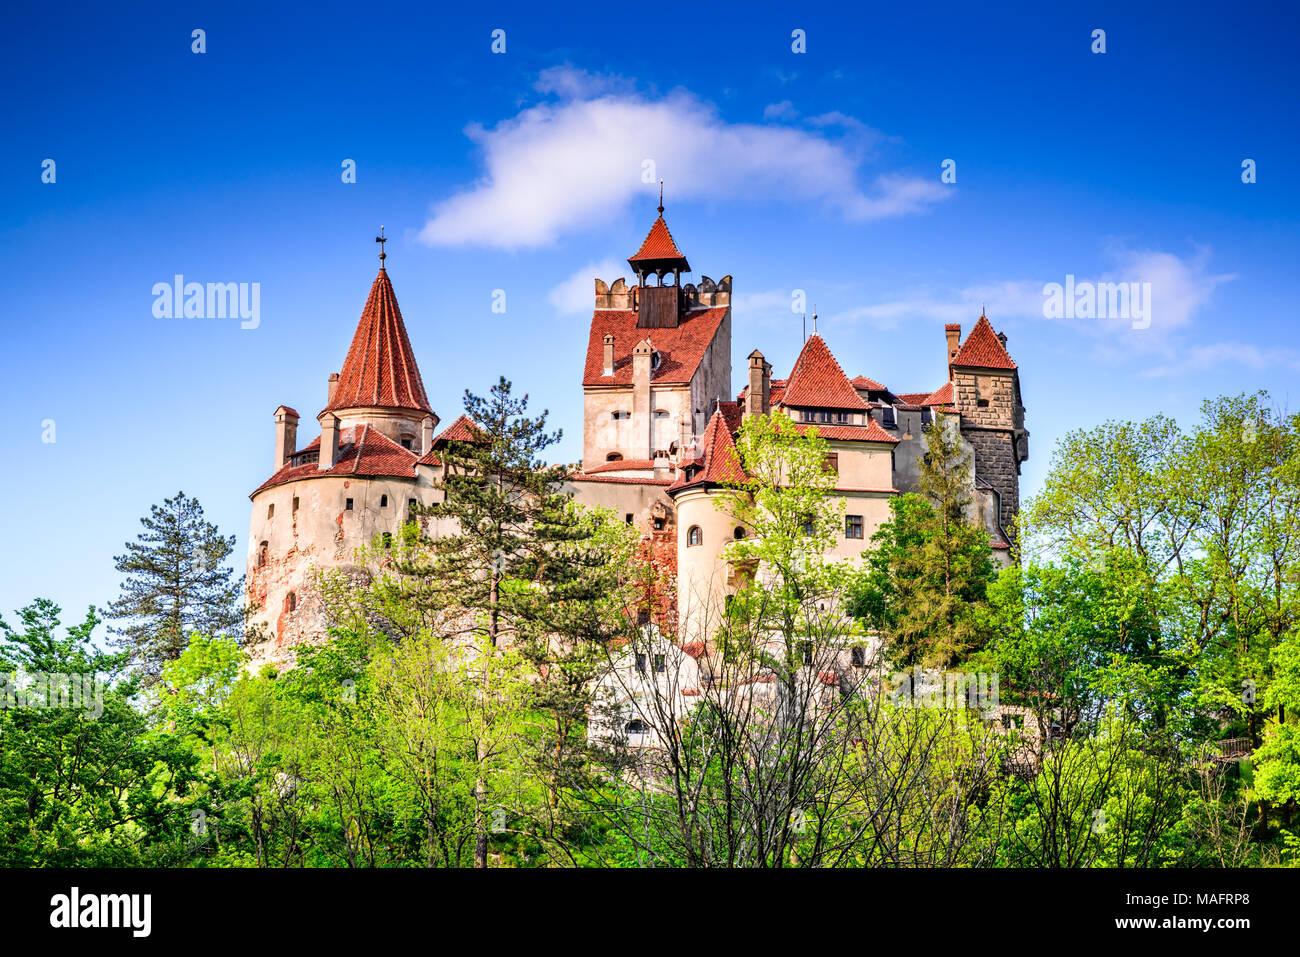 Draculas Schloss, Bran, Rumänien. Atemberaubender Frühling Bild von Vlad the Impaler Zitadelle in Kronstadt, Siebenbürgen, Osteuropa. Stockbild